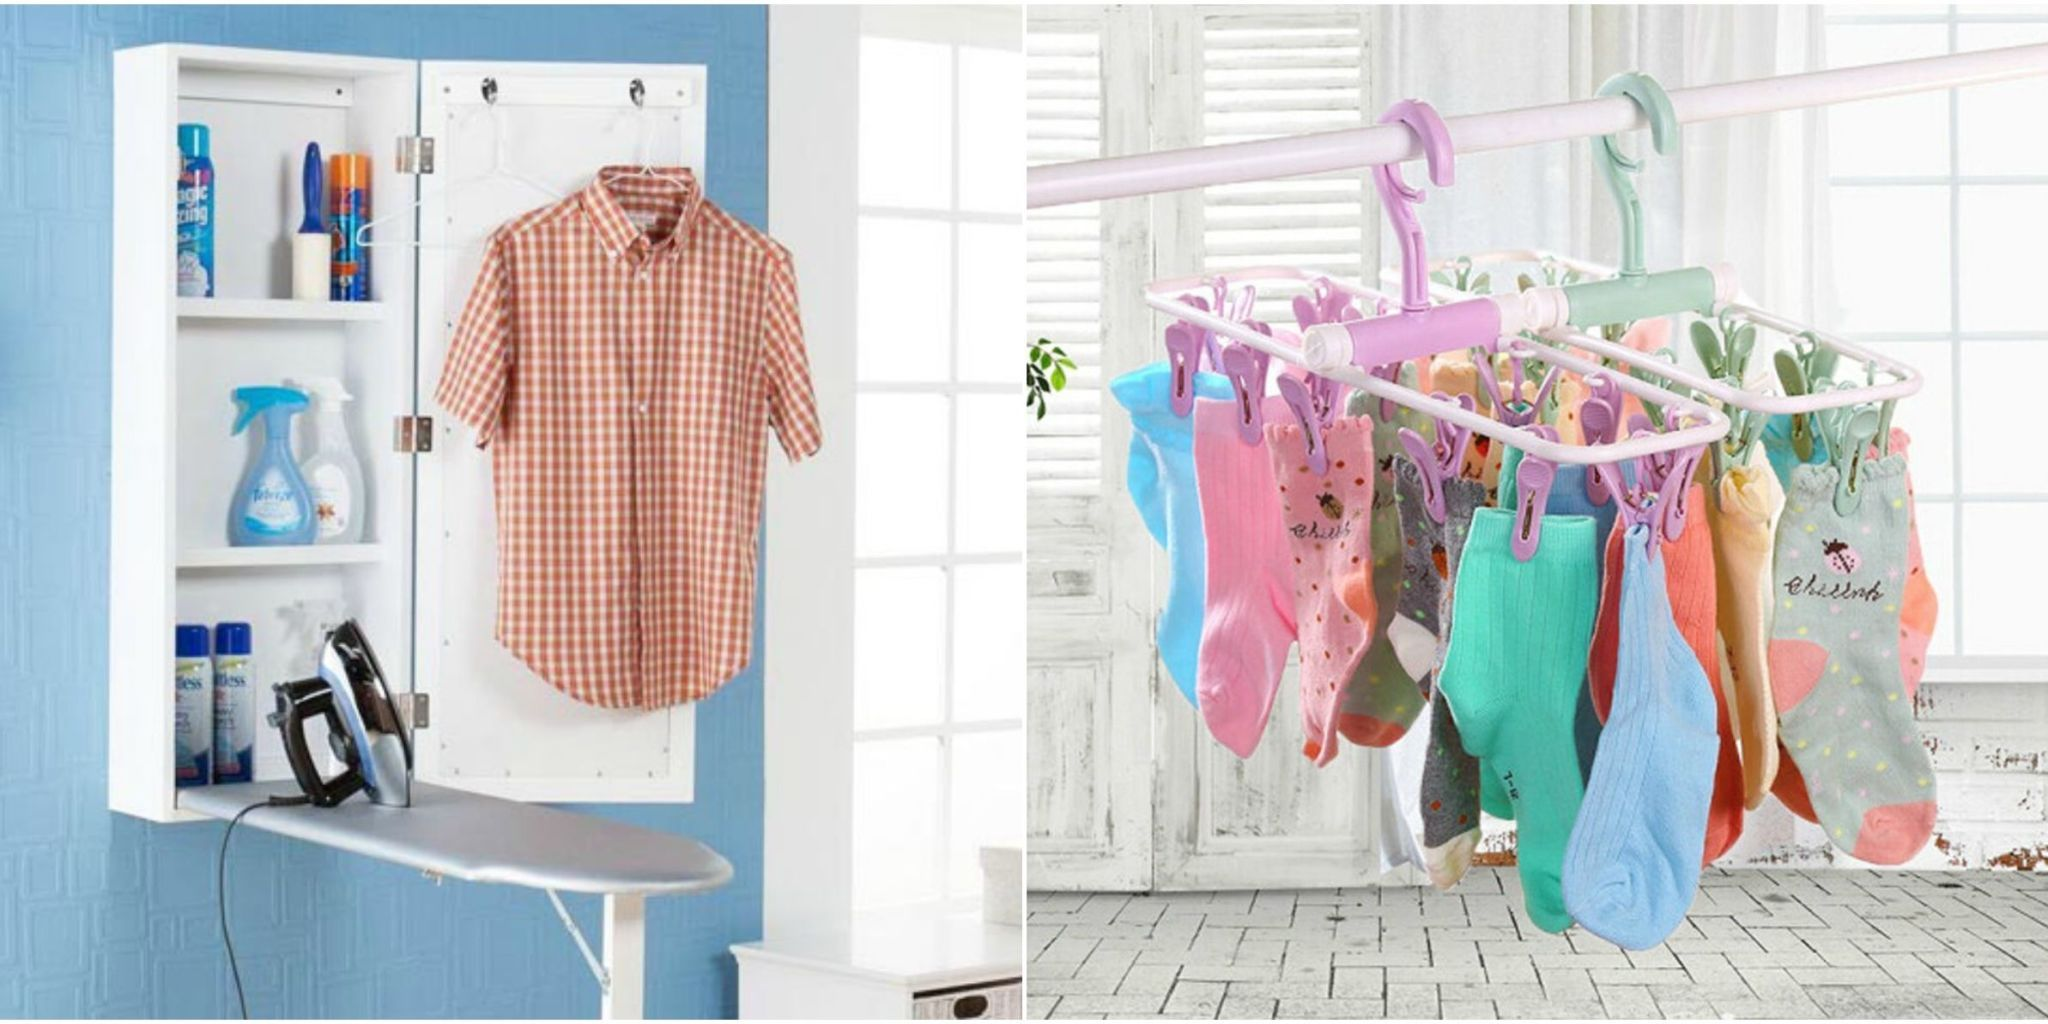 Laundry Organizers